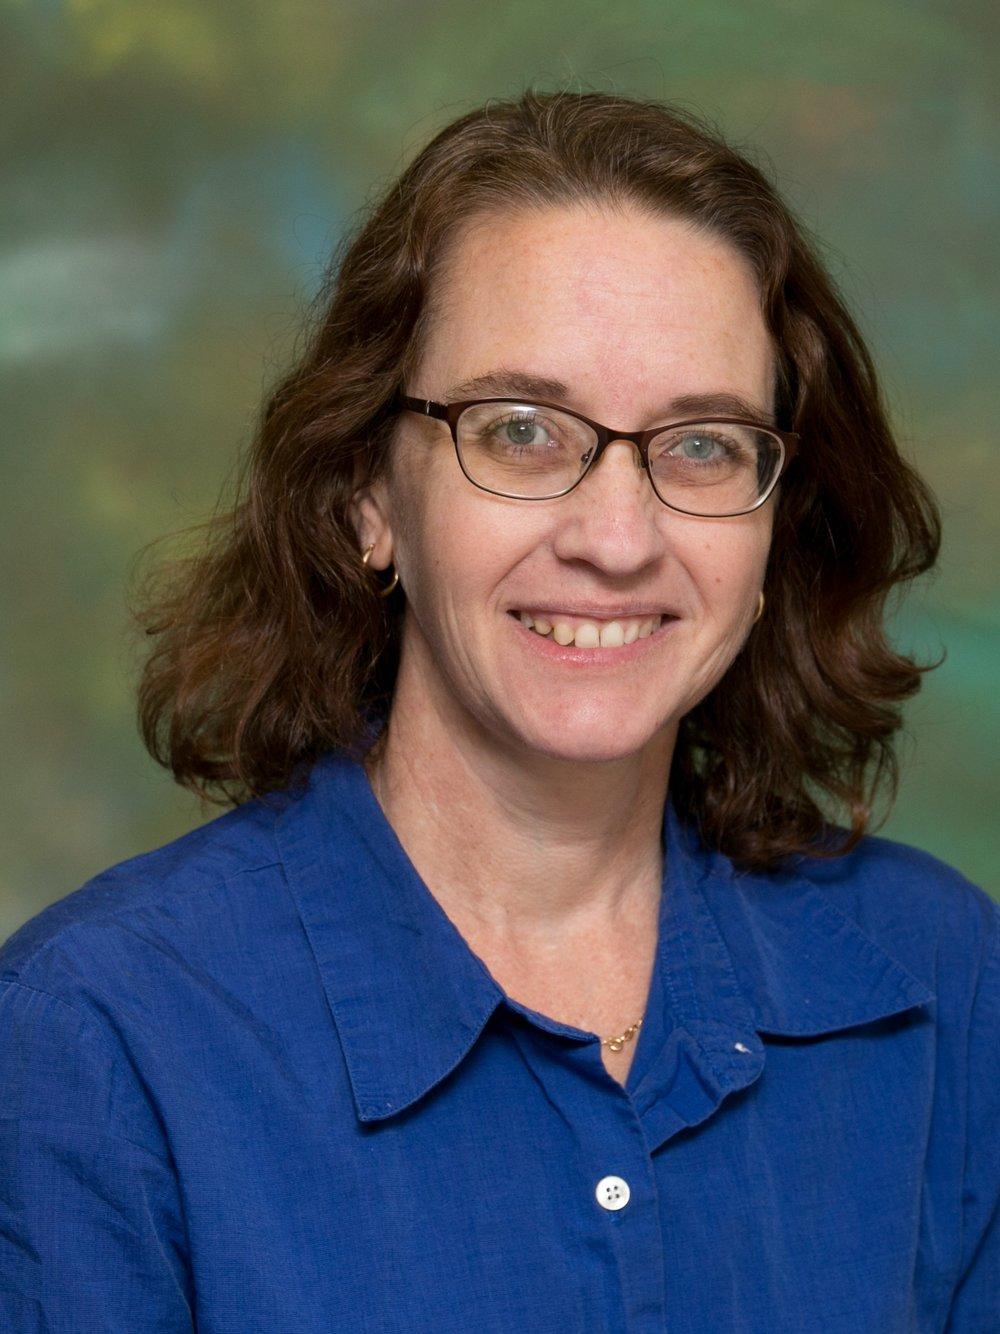 Nicole Boemanns - STEAMBS Chemistry, Minor MathJoined Staff 2008-2014 & 2016